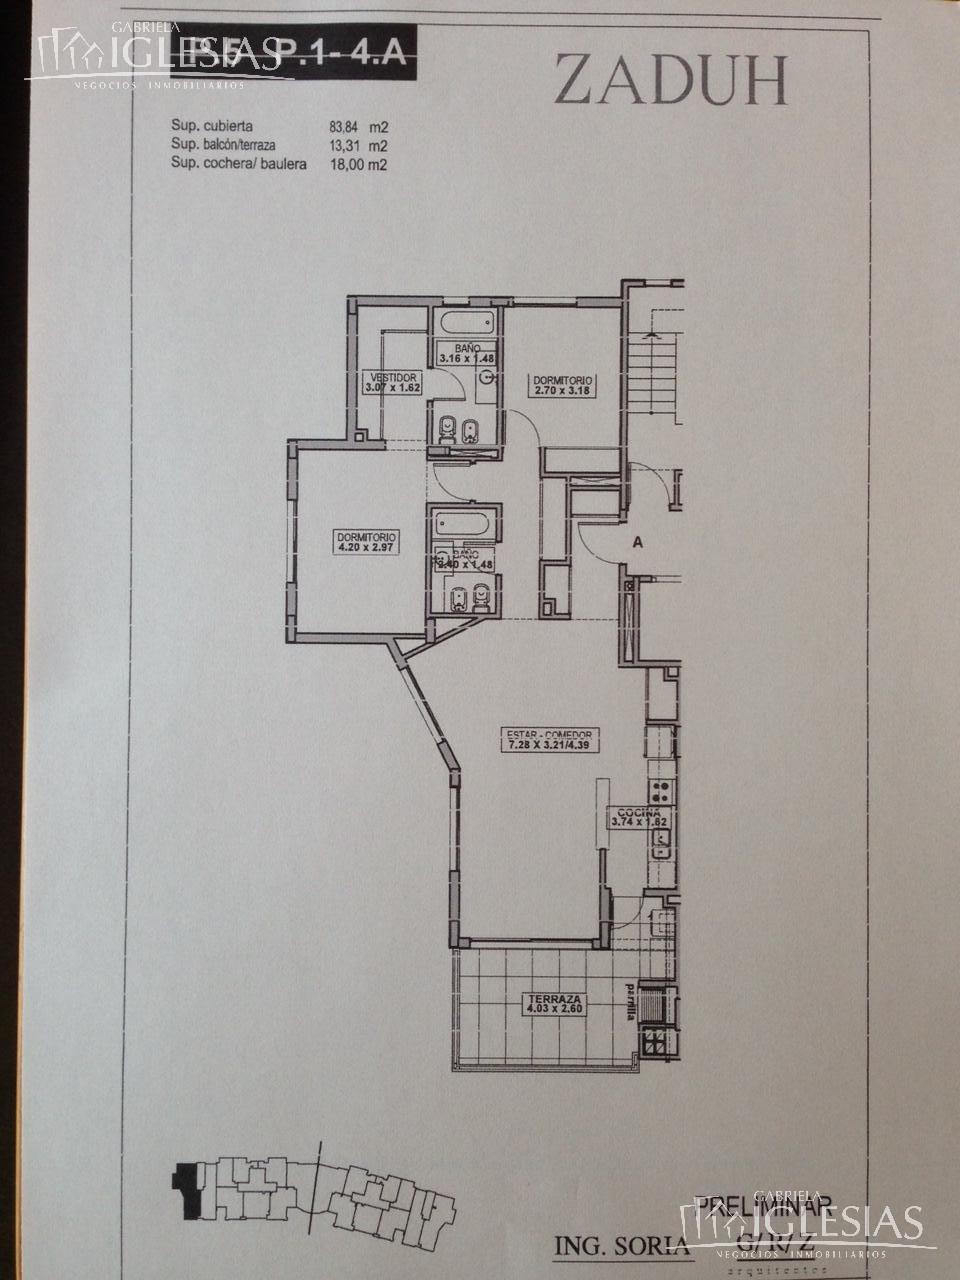 Departamento en Alquiler temporario Alquiler en Zaduh a Alquiler temporario - $ 27.500 Alquiler - $ 18.500